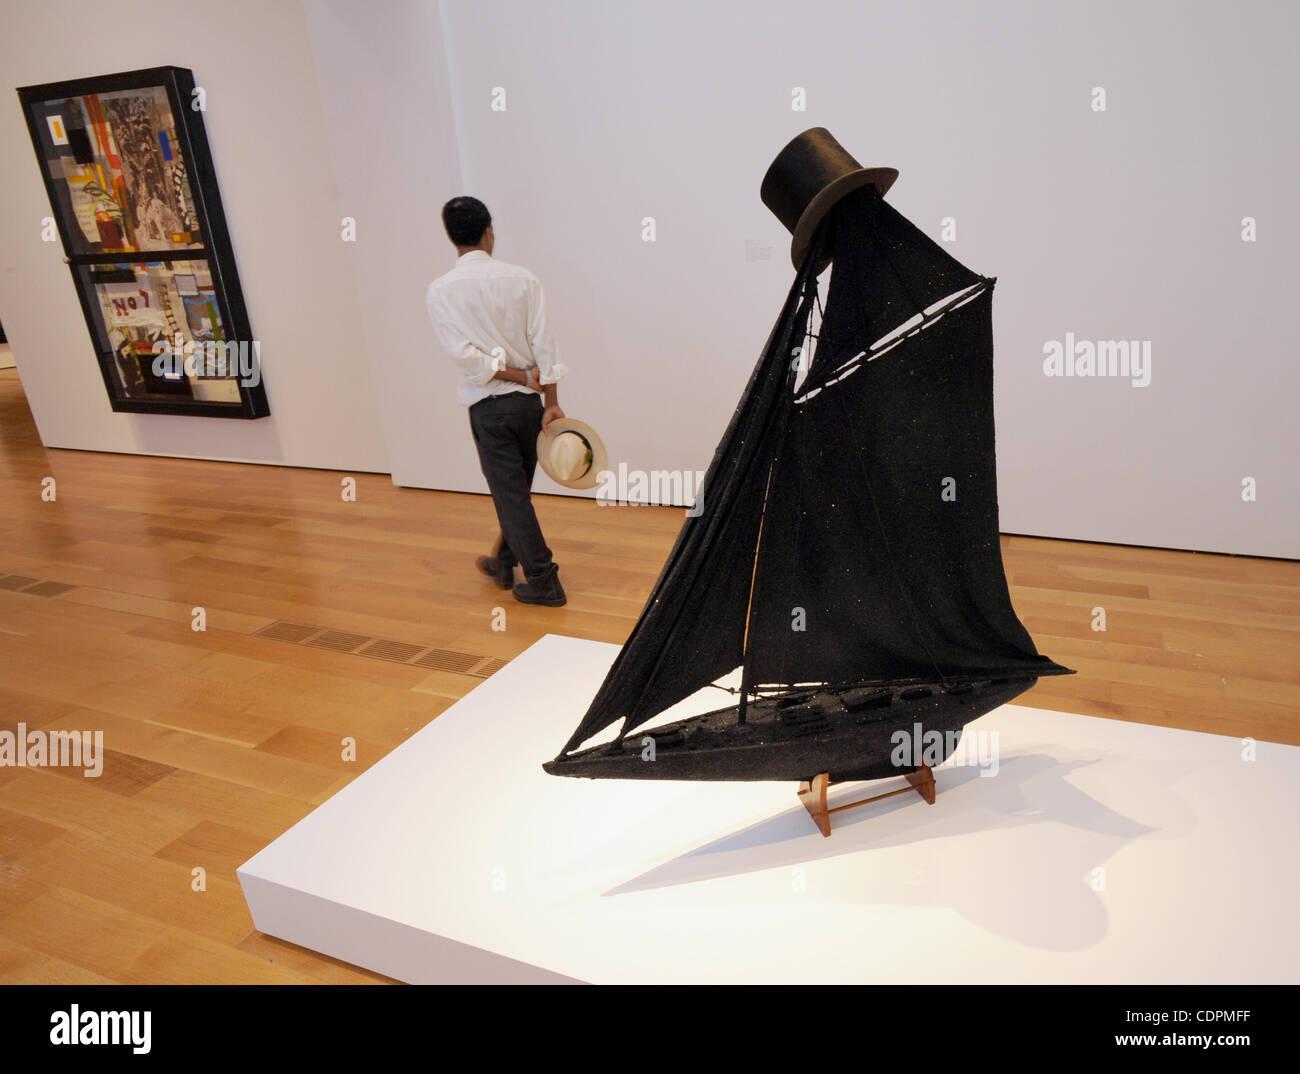 June 20, 2011 - Atlanta, GA, U.S. - ATLANTA, GA - JUNE 18: Artist Radcliffe Bailey walks away from Tricky, among - Stock Image